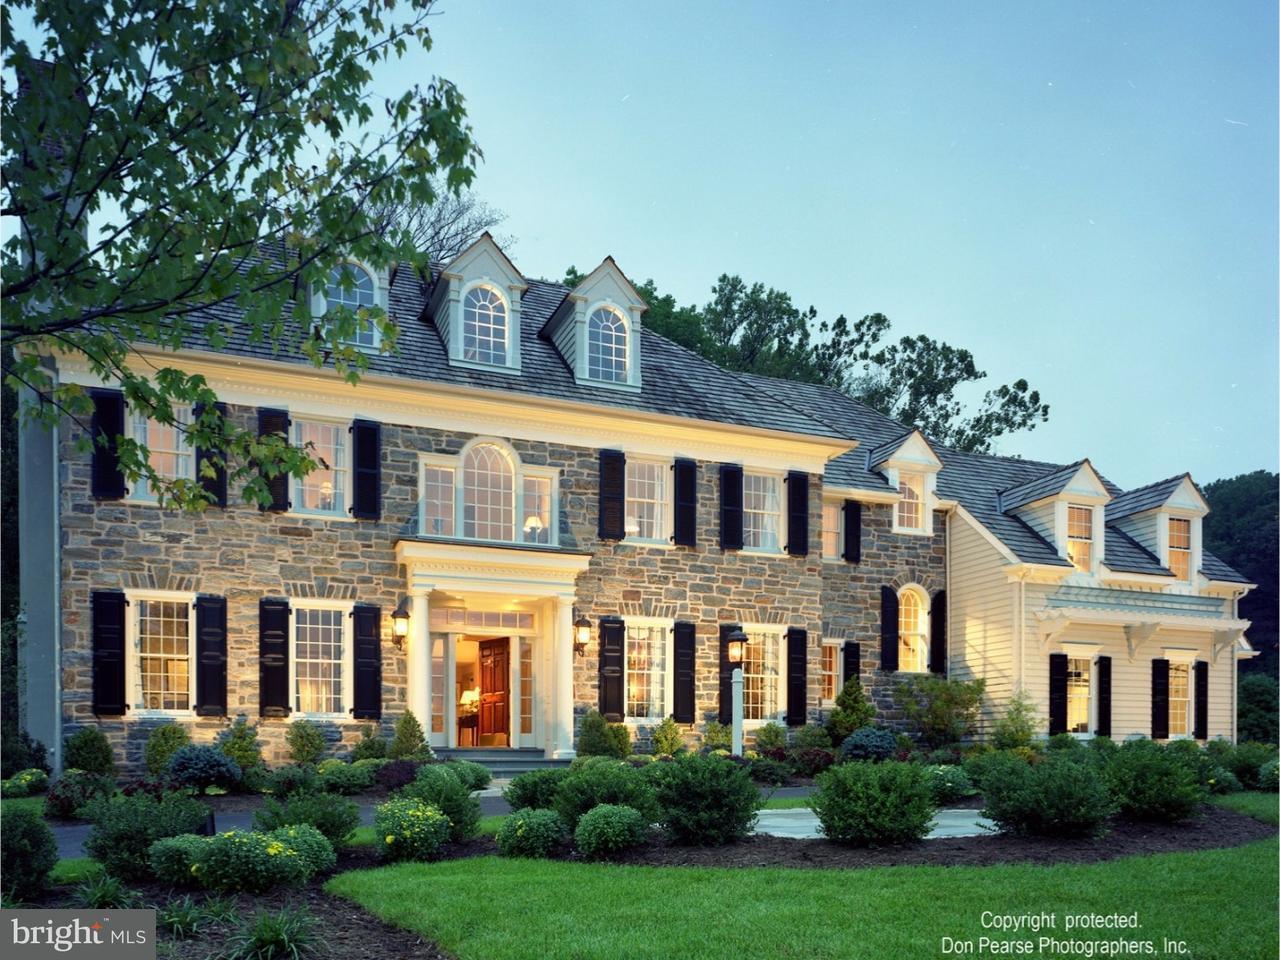 Single Family Home for Sale at 1579 HIGHGROVE Lane Malvern, Pennsylvania 19355 United States